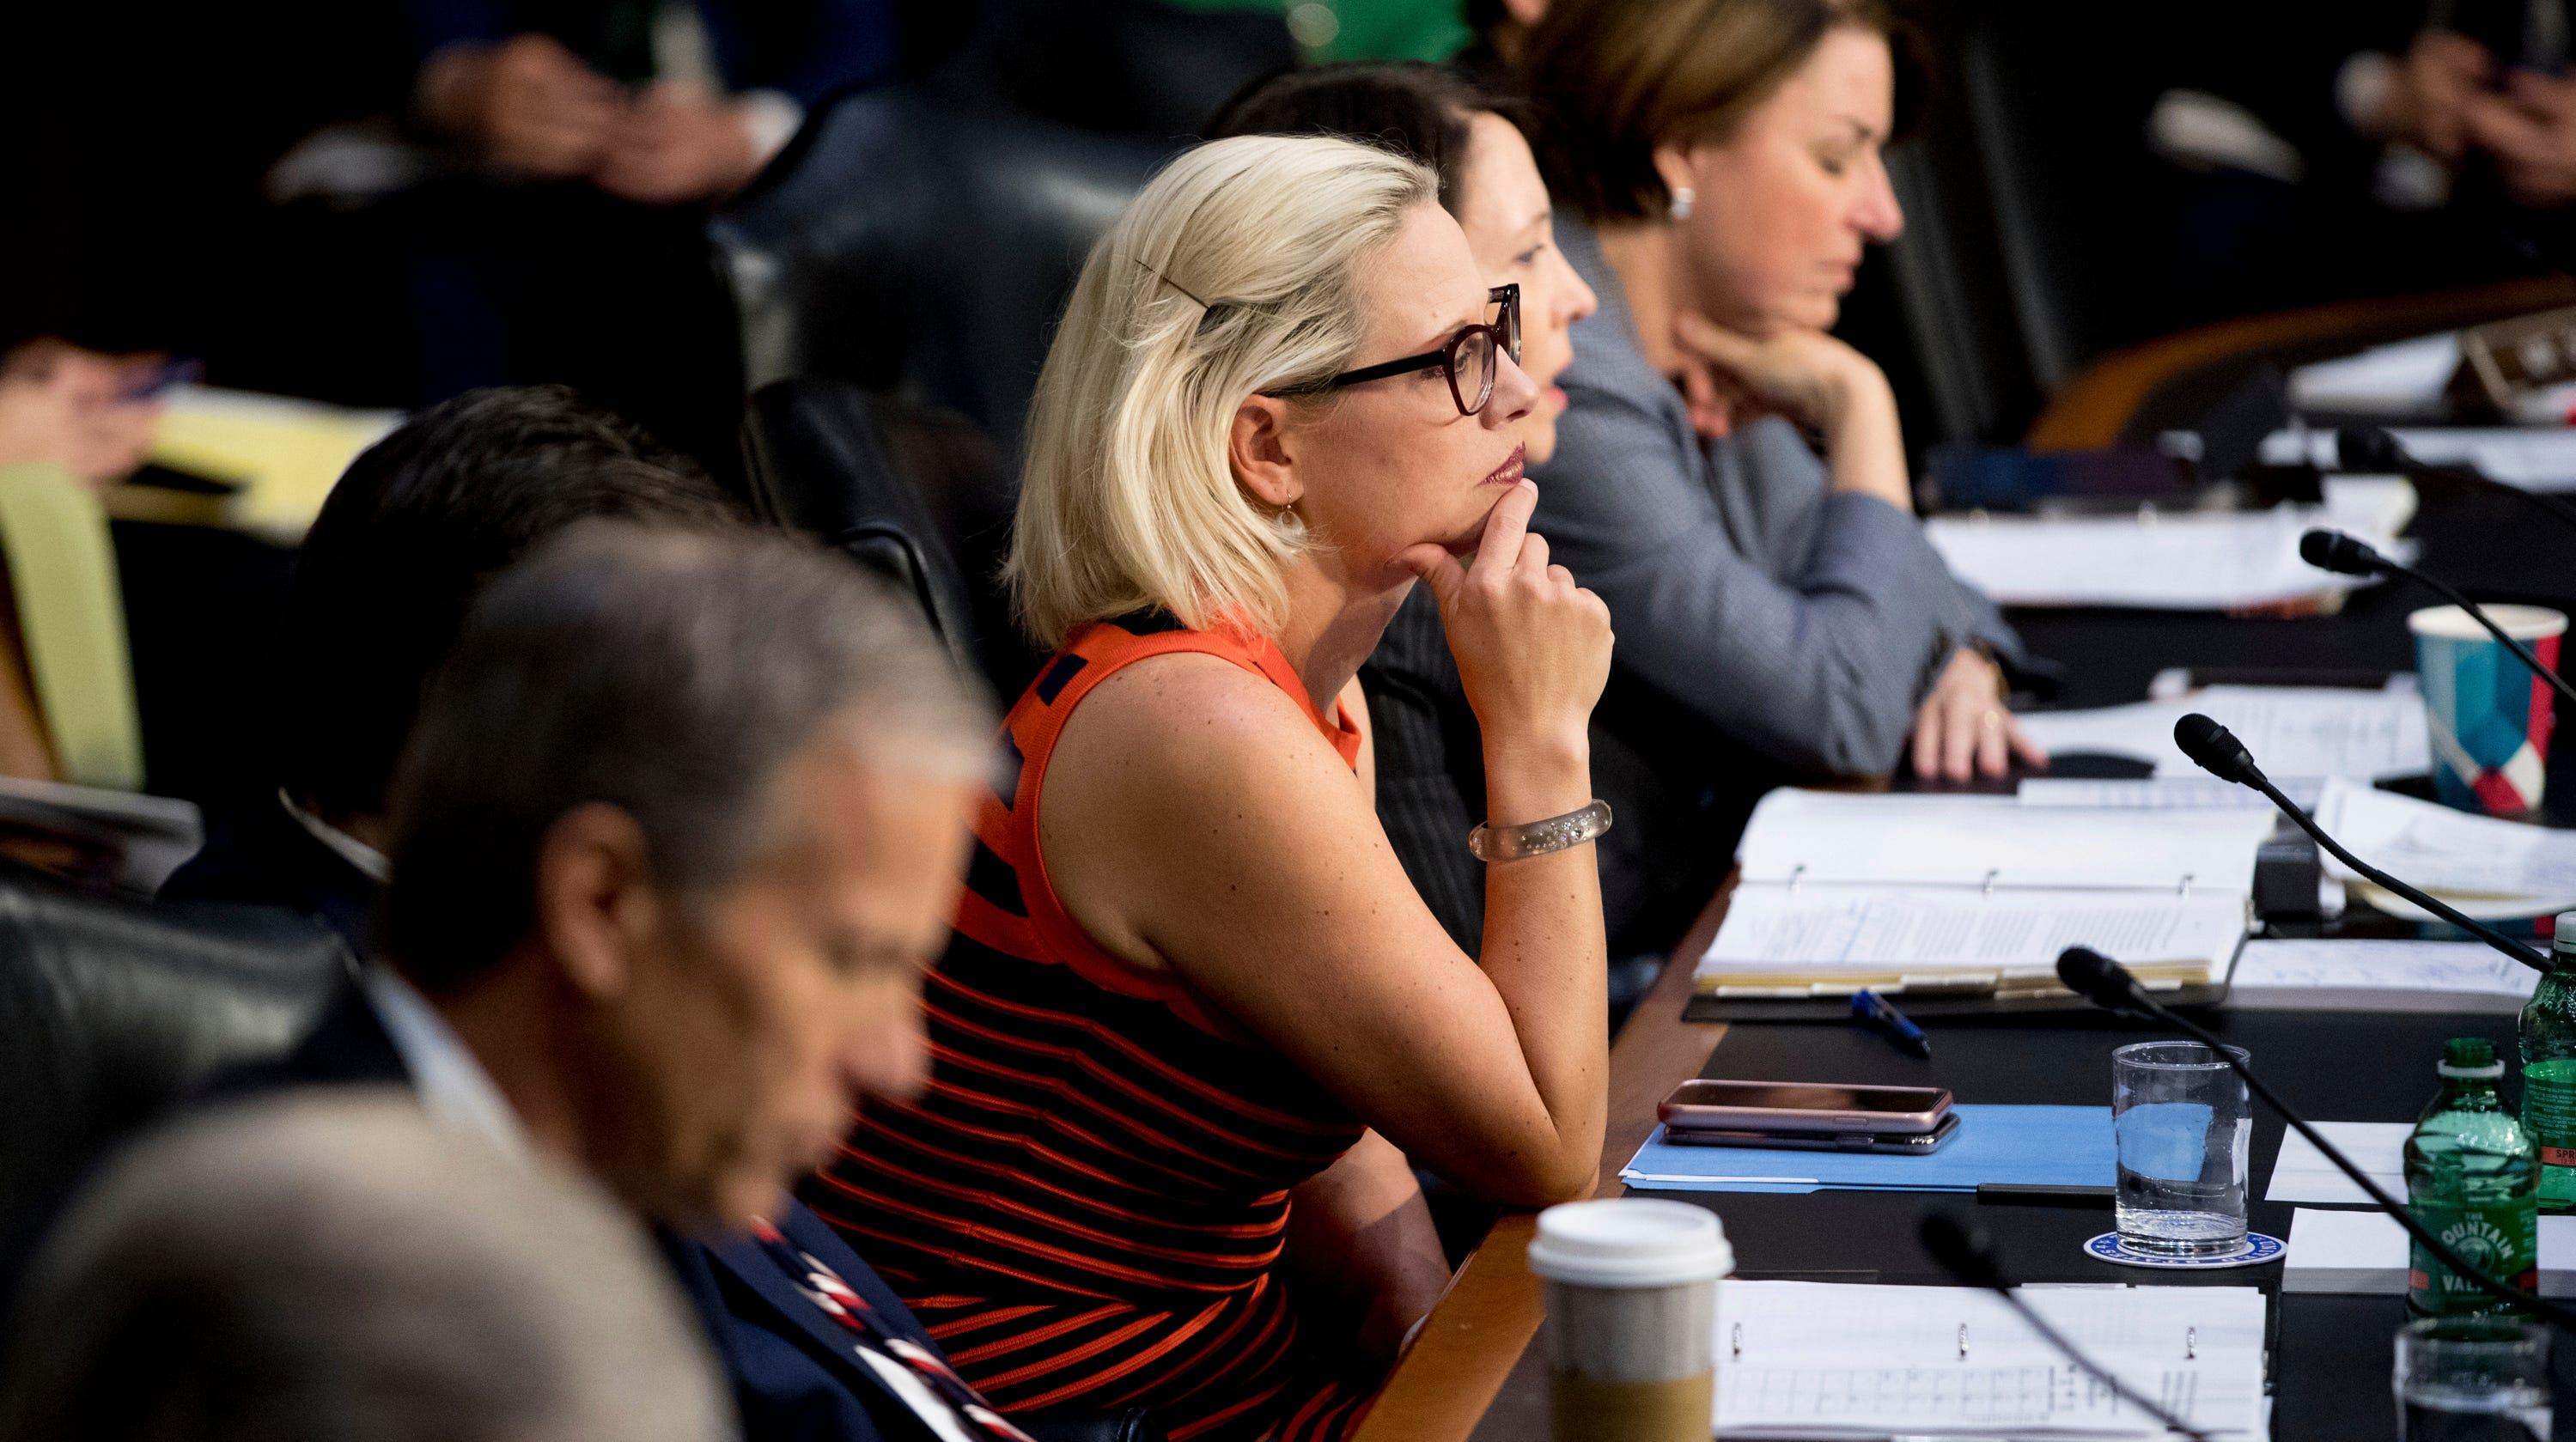 Sen. Kyrsten Sinema wants to cut bureaucratic red tape, tackles regulatory reform